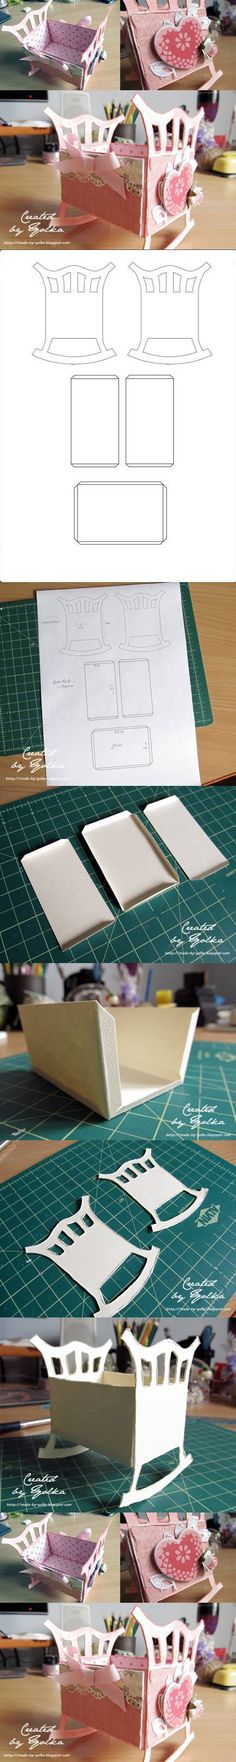 DIY Paper Crib DIY Paper Crib